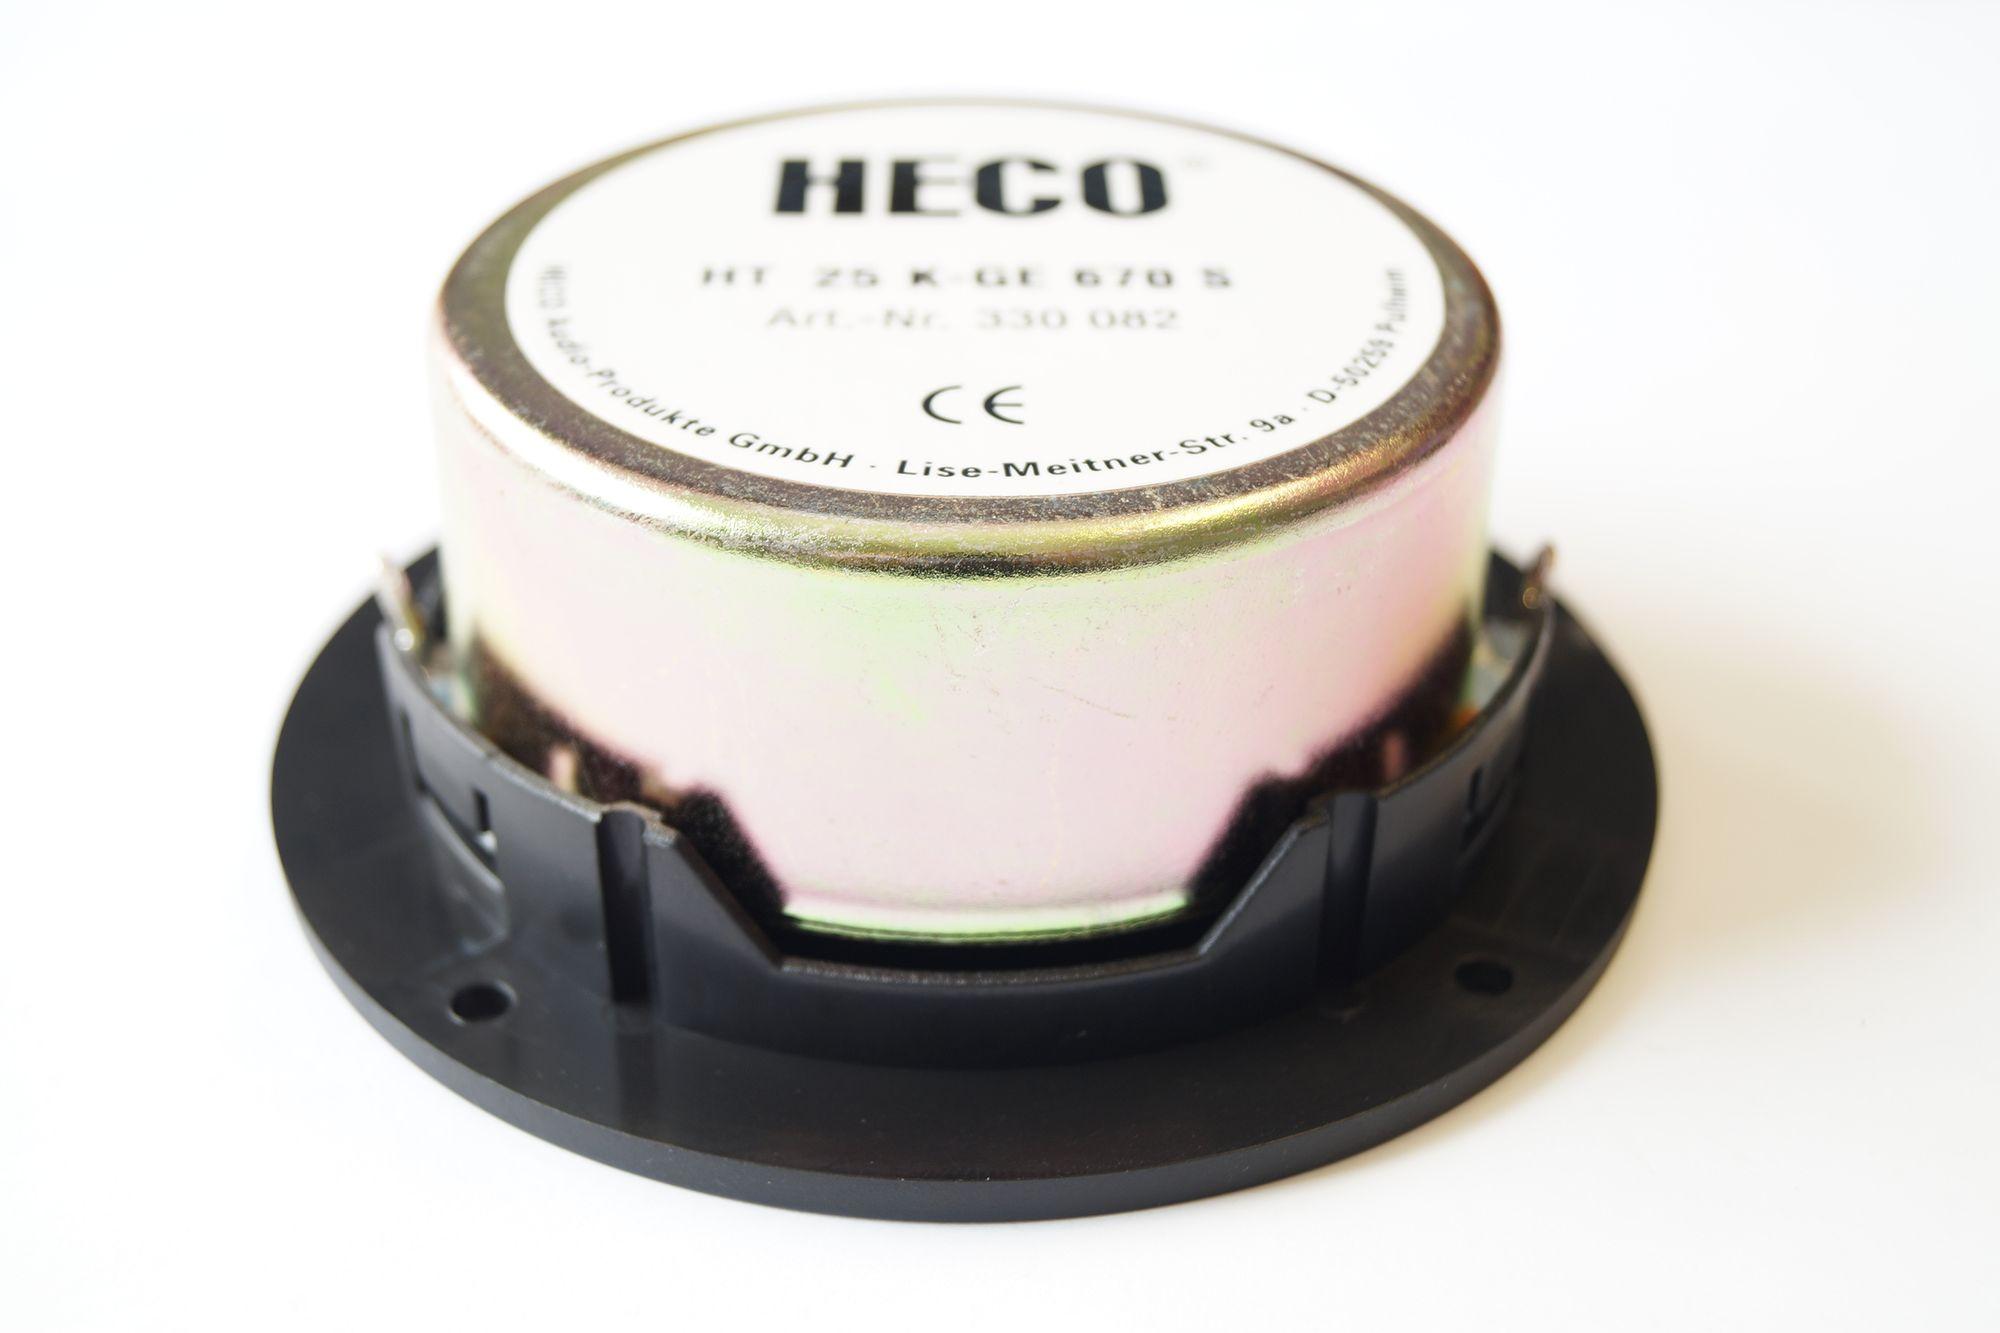 1 Paar 25 mm Gewebe Hochton-Kalotte Heco HT25K-GE670 S 75 Watt max., Serviceware – Bild 3